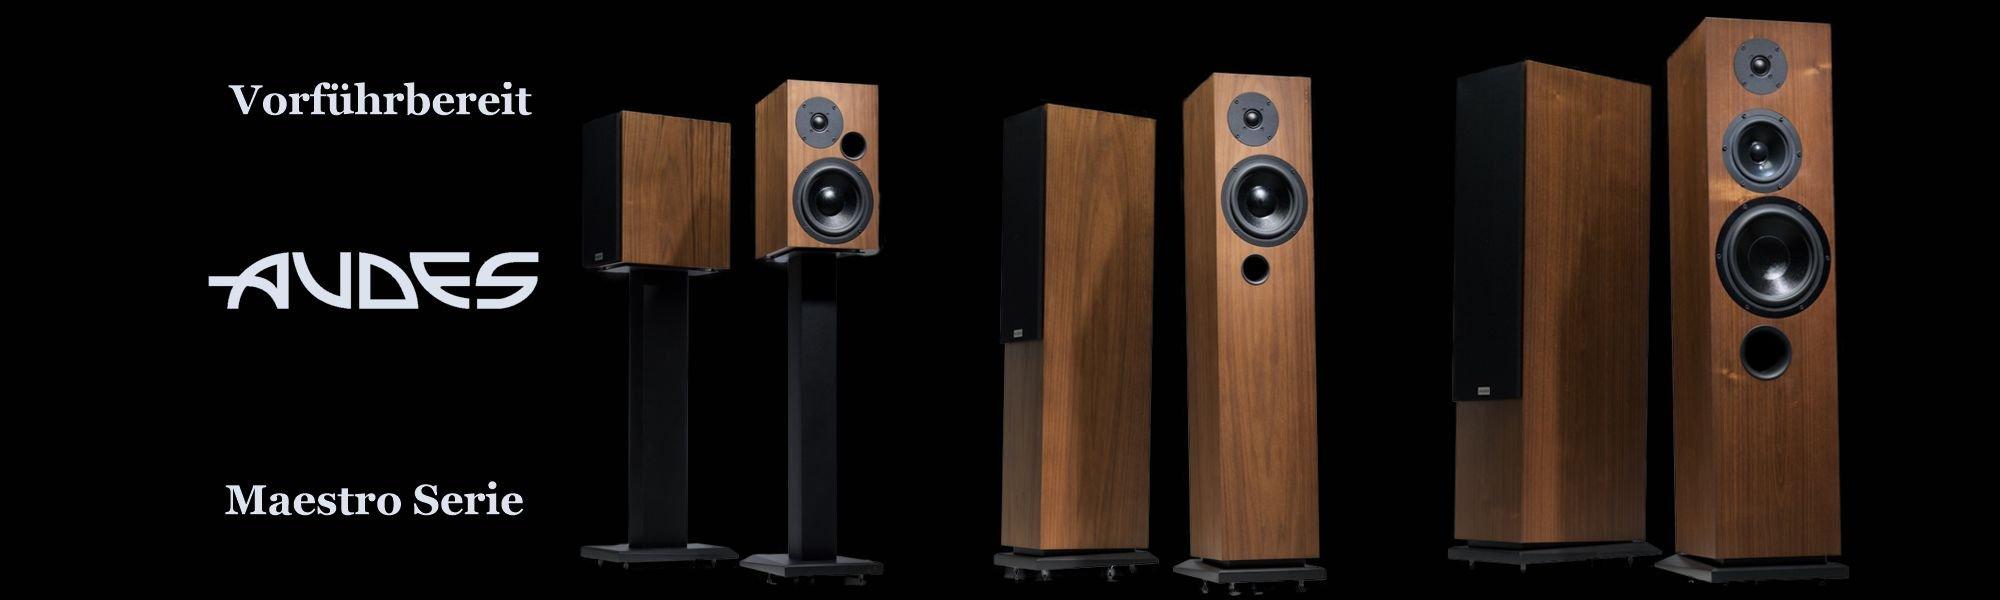 AUDES Lautsprecher Maestro Serie